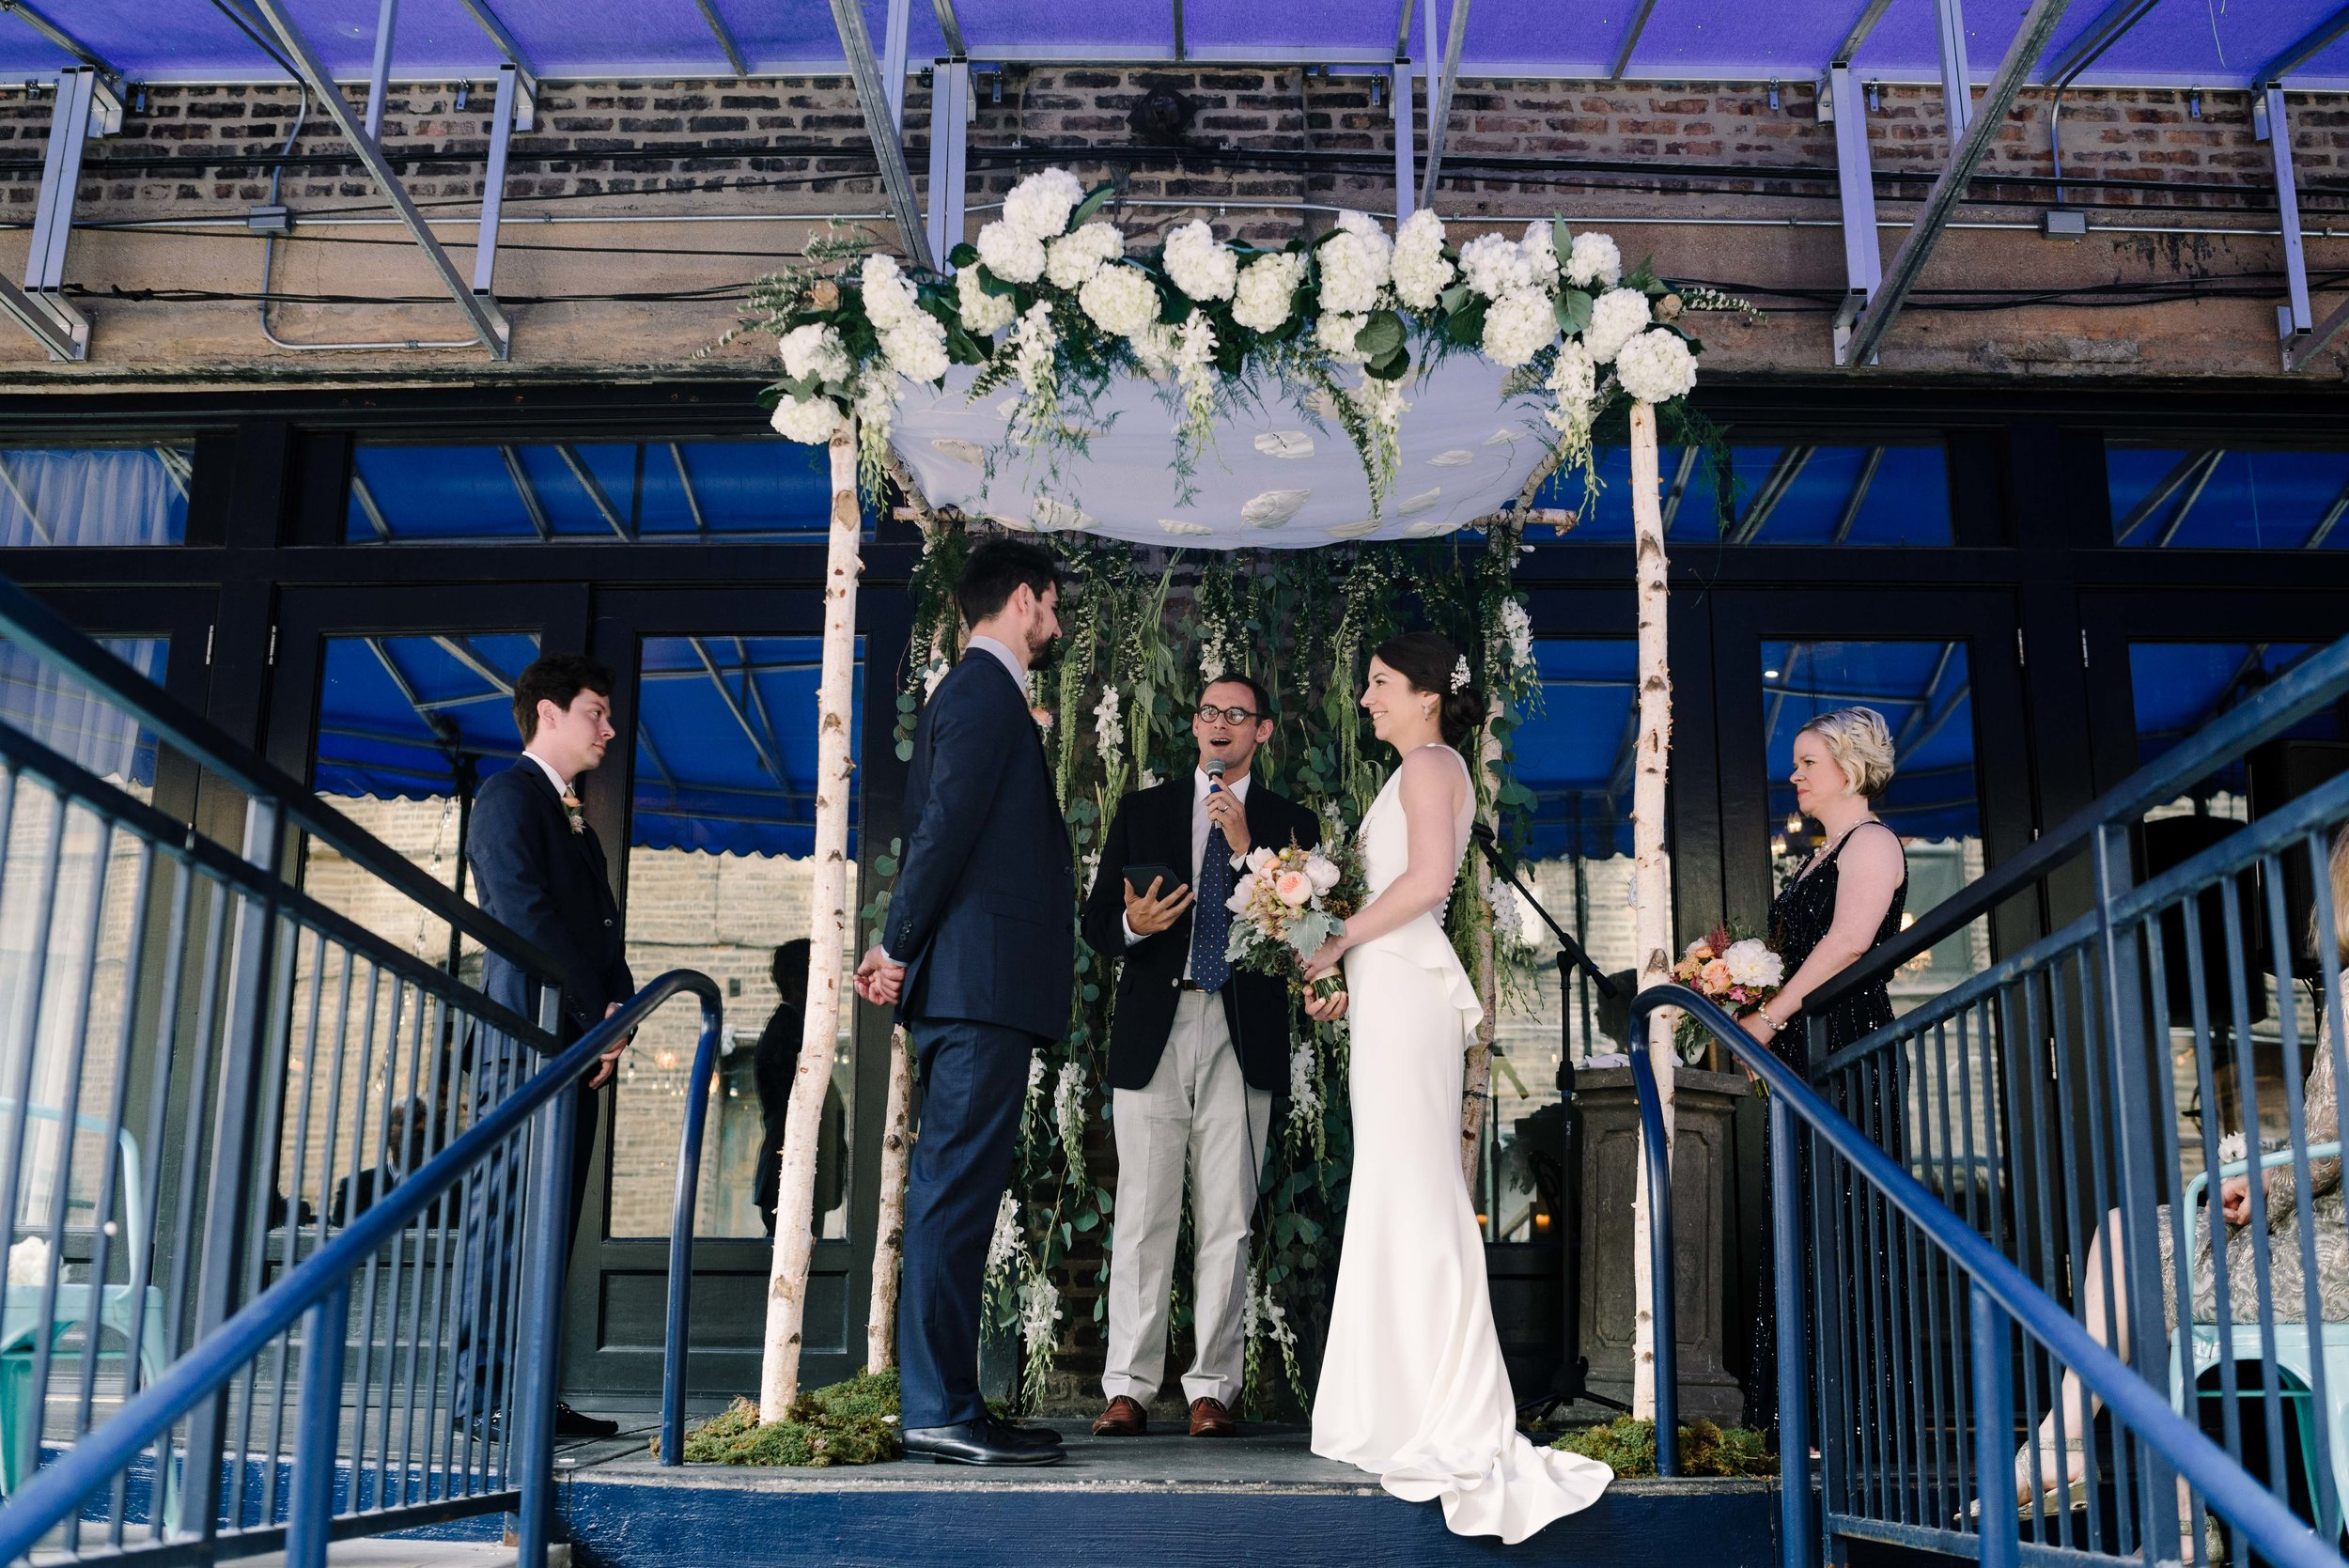 Patricia-Steve-Blog-Indianapolis-Wedding-61.jpg